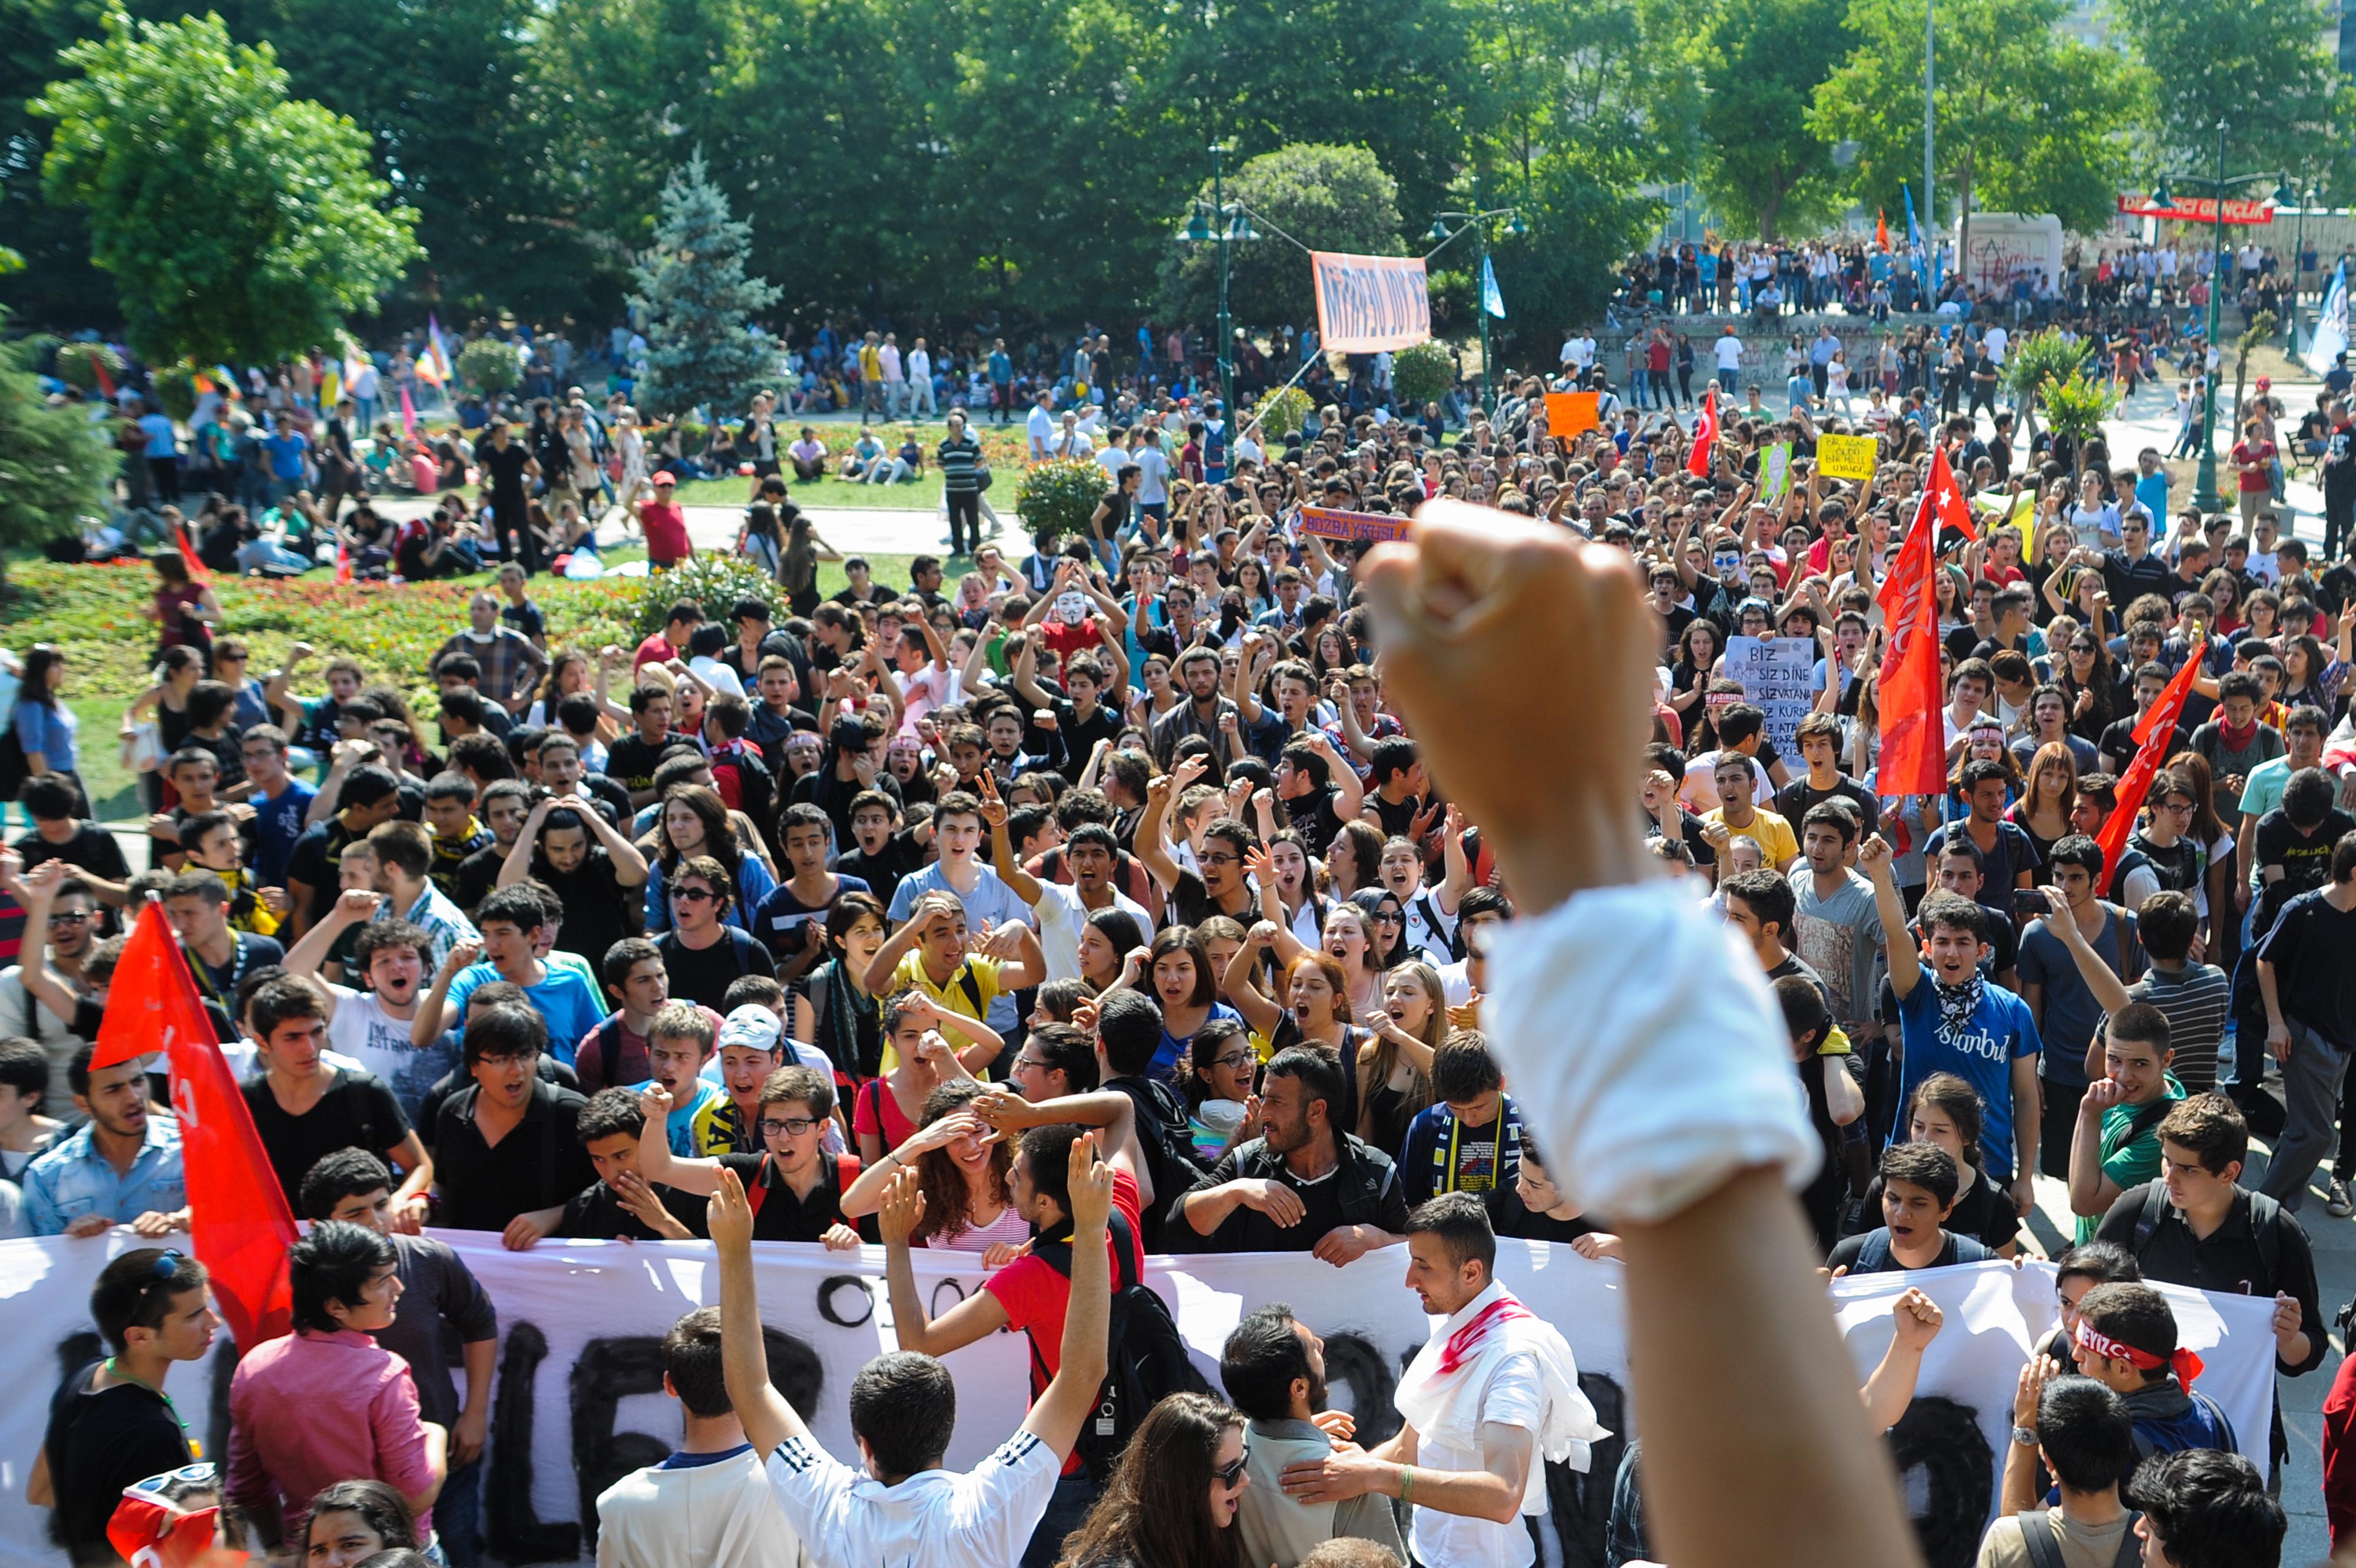 File:Peaceful daytime demonstrations in Taksim park. Events of June 3, 2013-6.jpg - Wikimedia ...